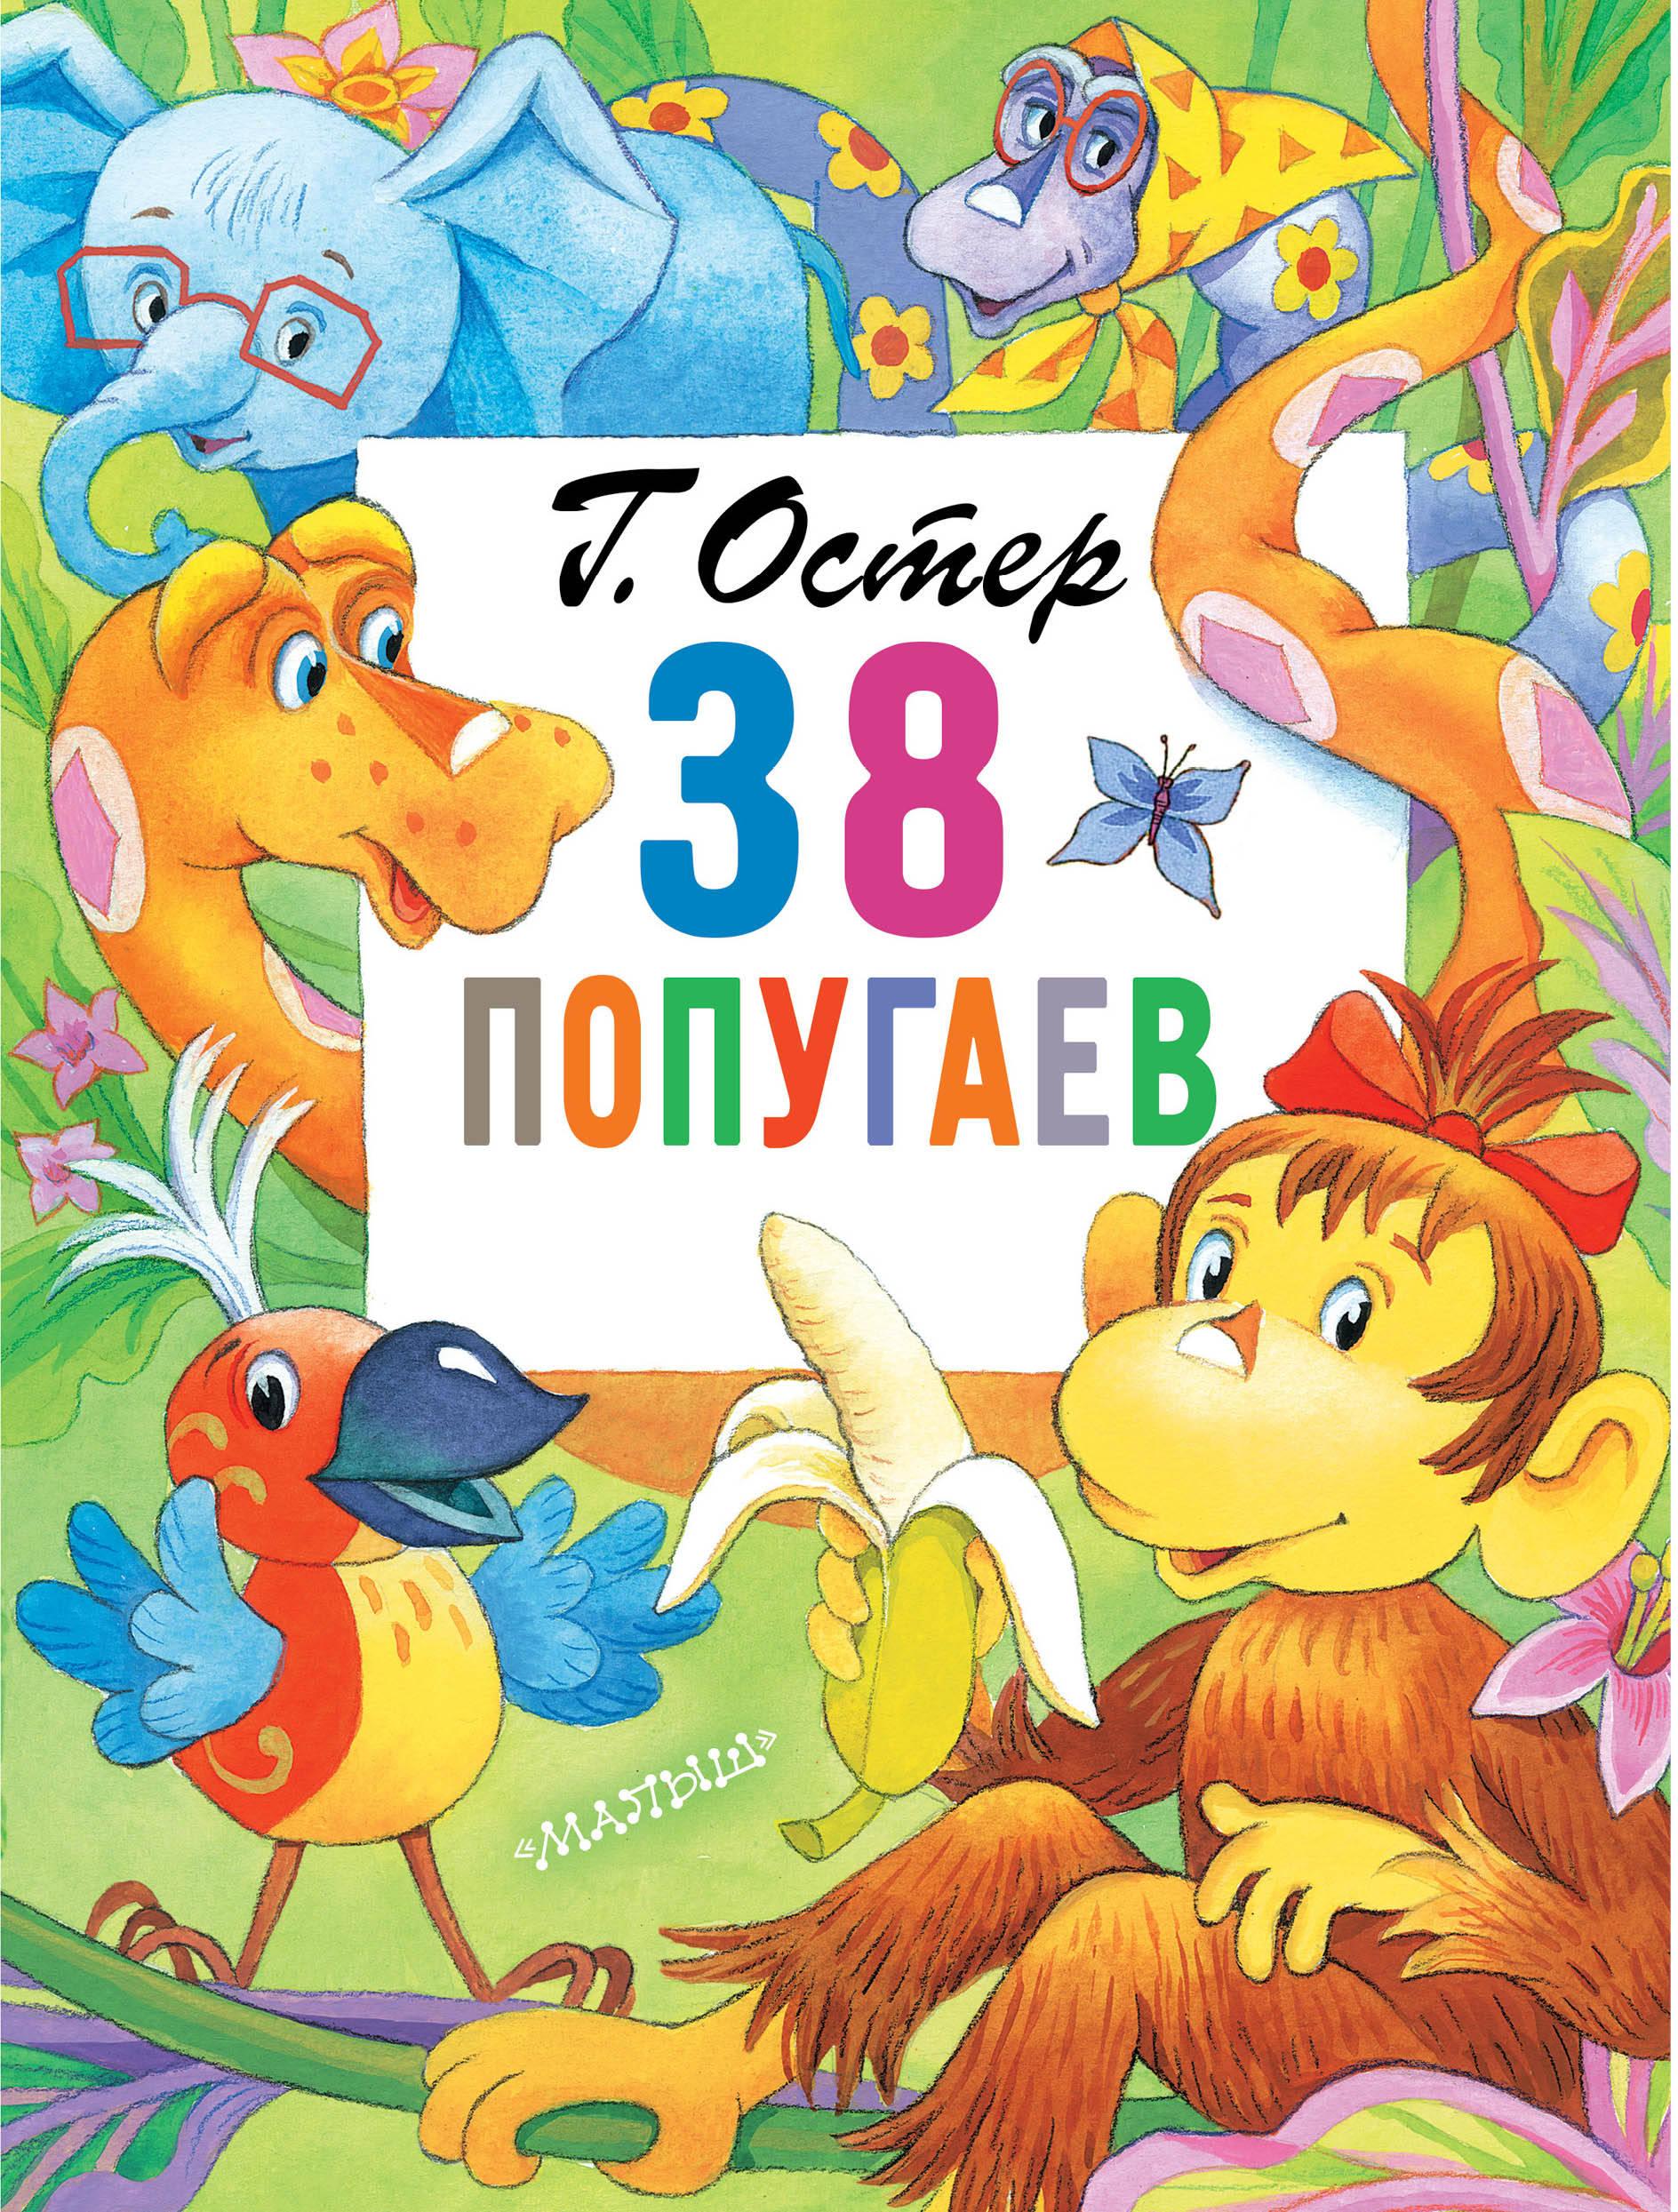 38 popugaev